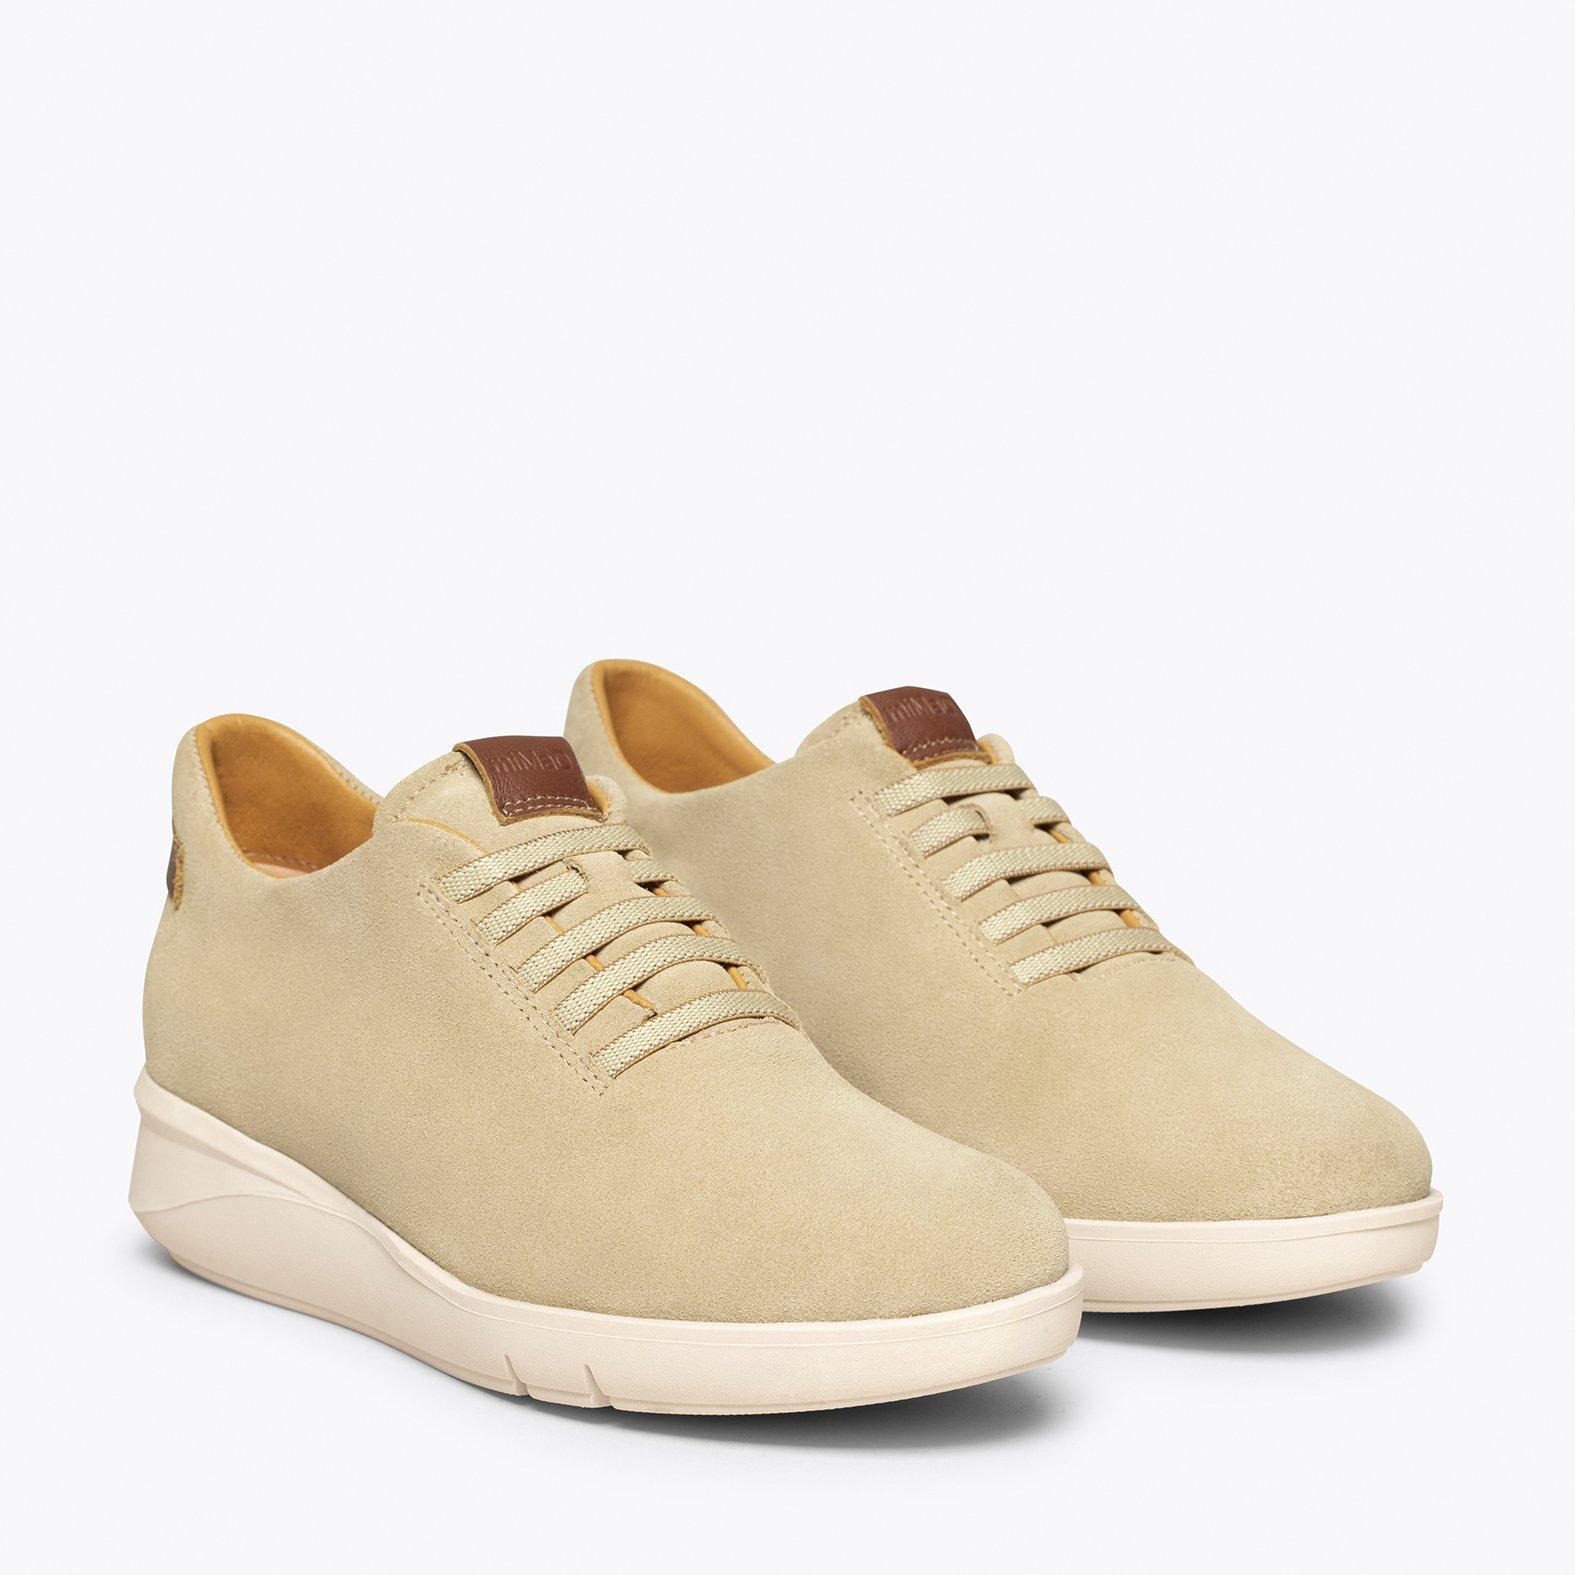 COCKTAIL Zapato destalonado NEGRO